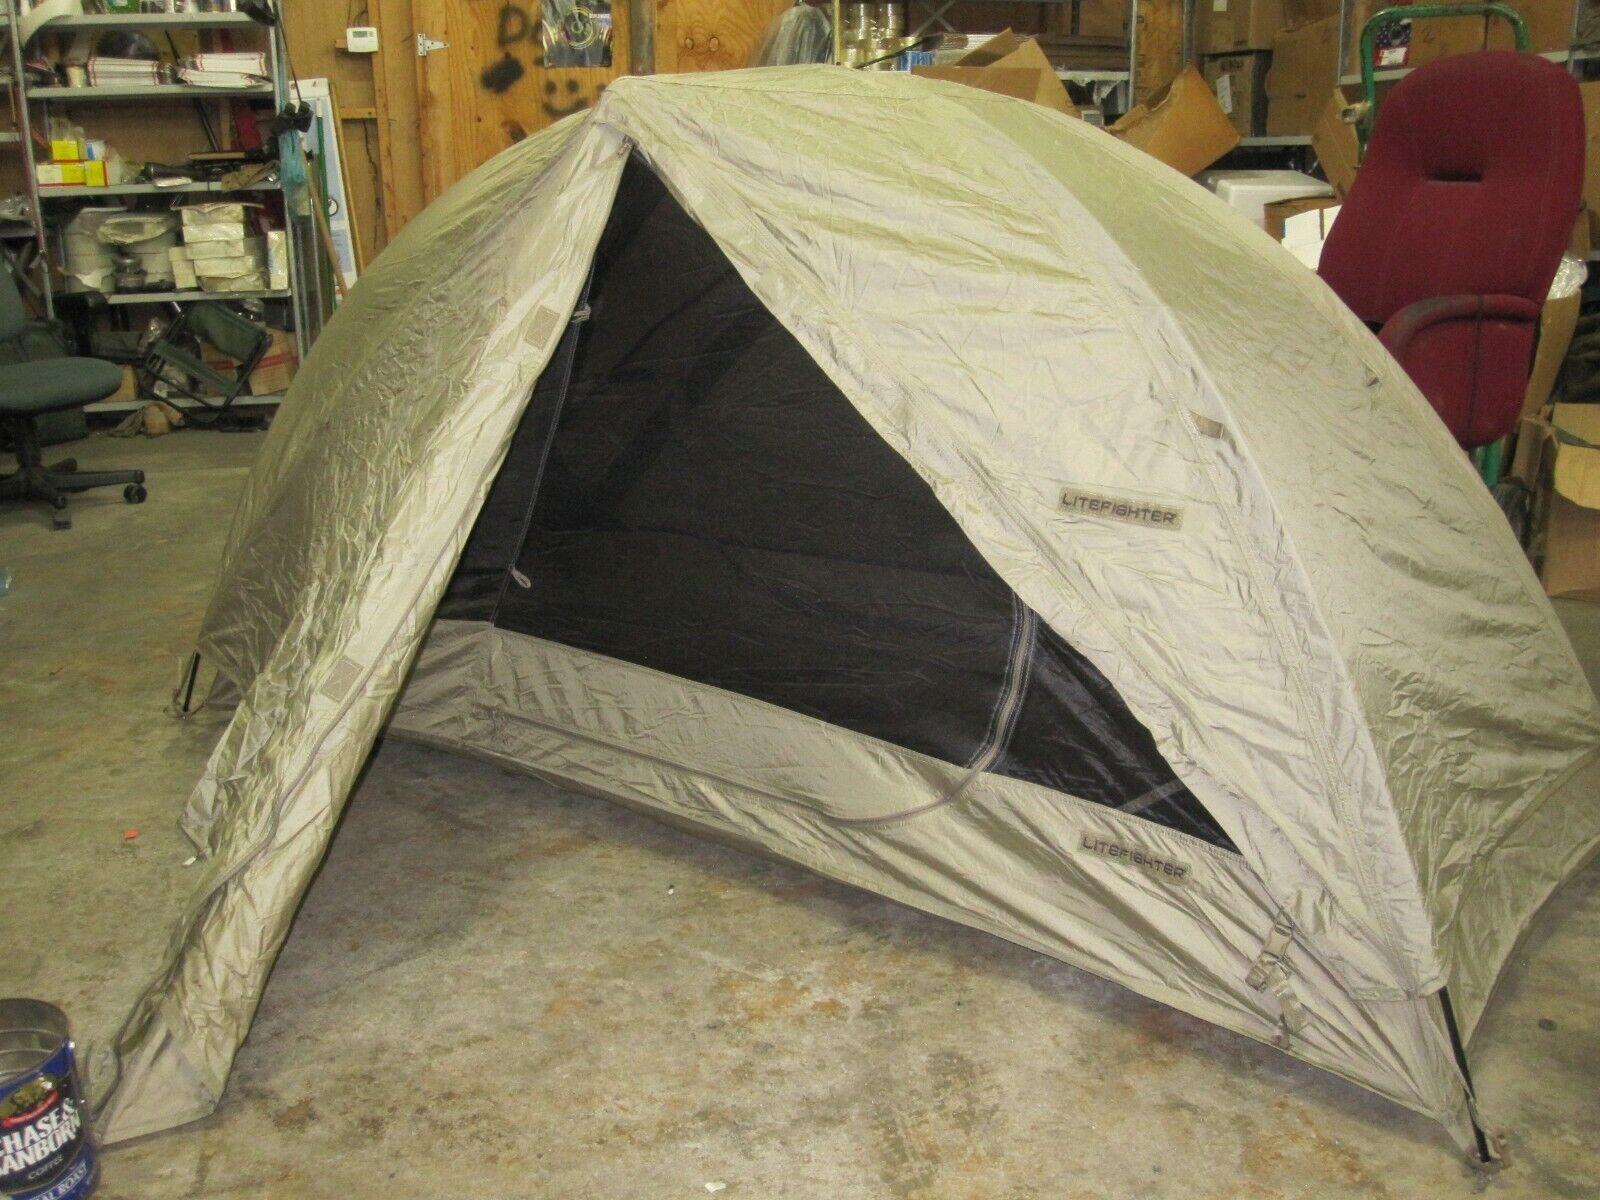 Neuwertig USGI Litefighter 1 Individuelle Schutz System Tan Leicht Tragbar Zelt